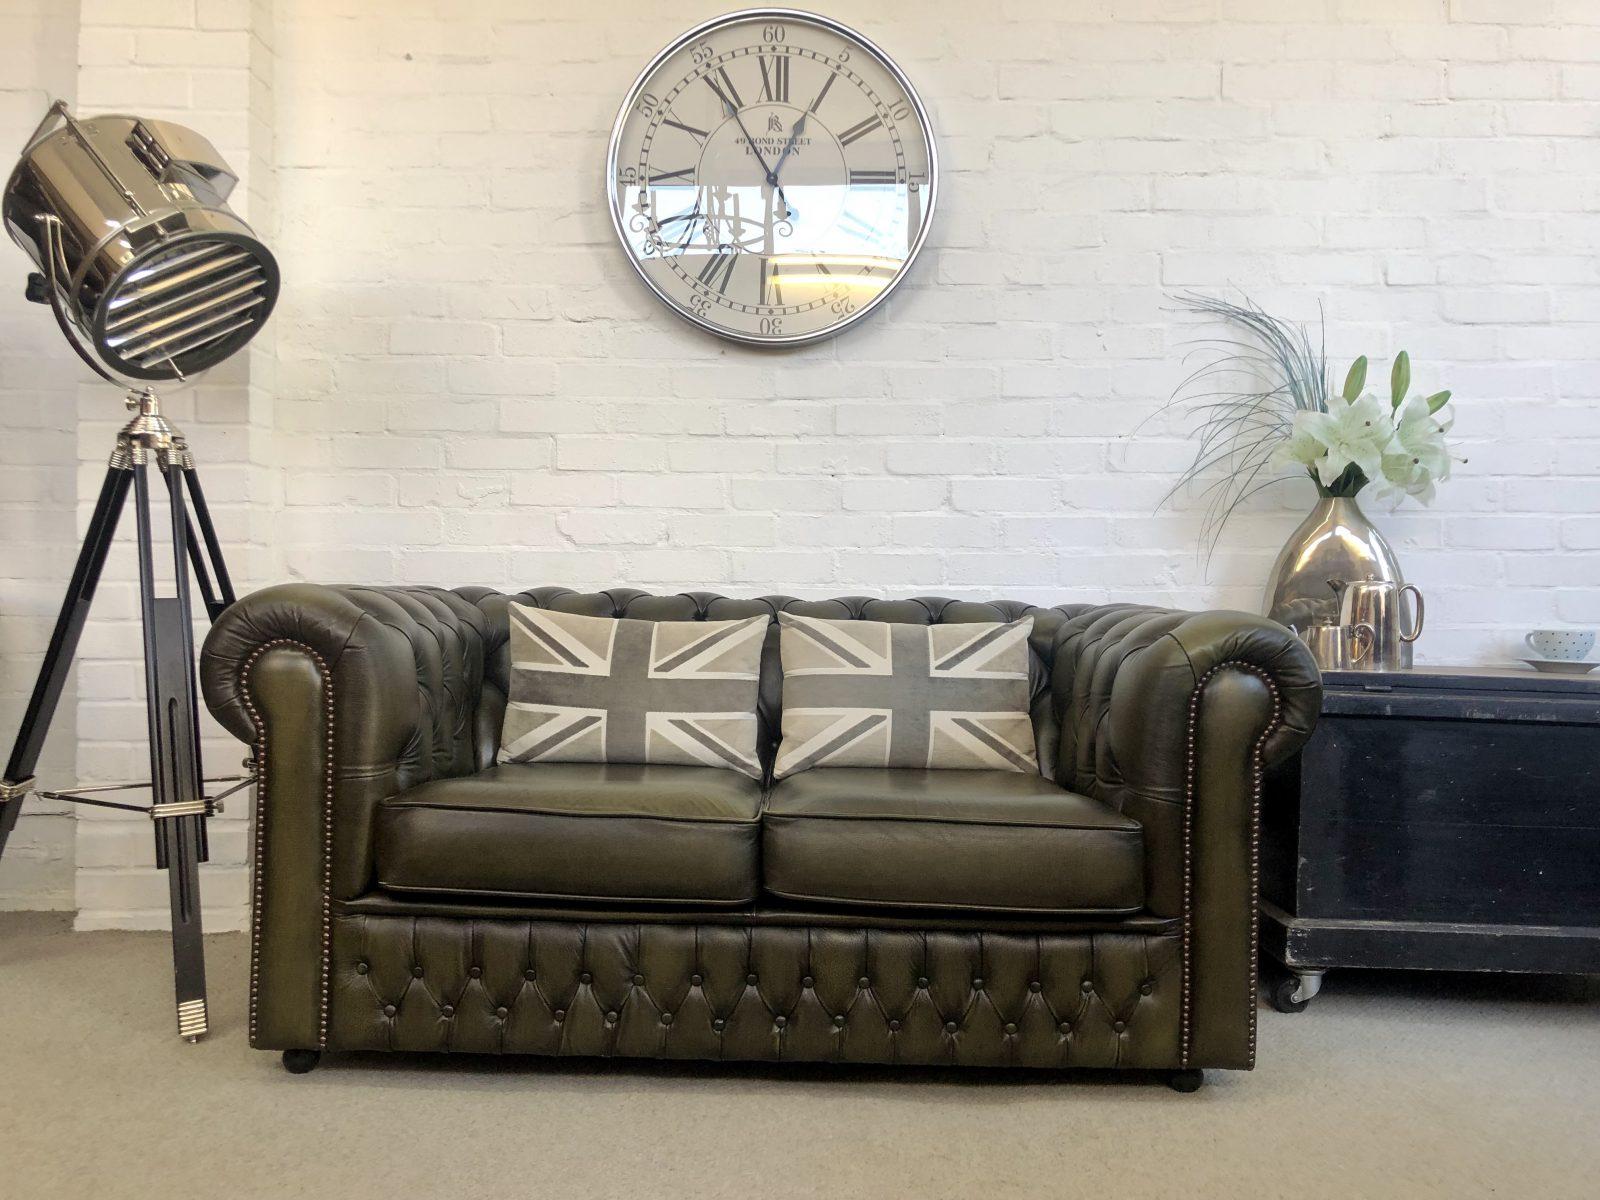 Olive Green Saxon Chesterfield Sofa.